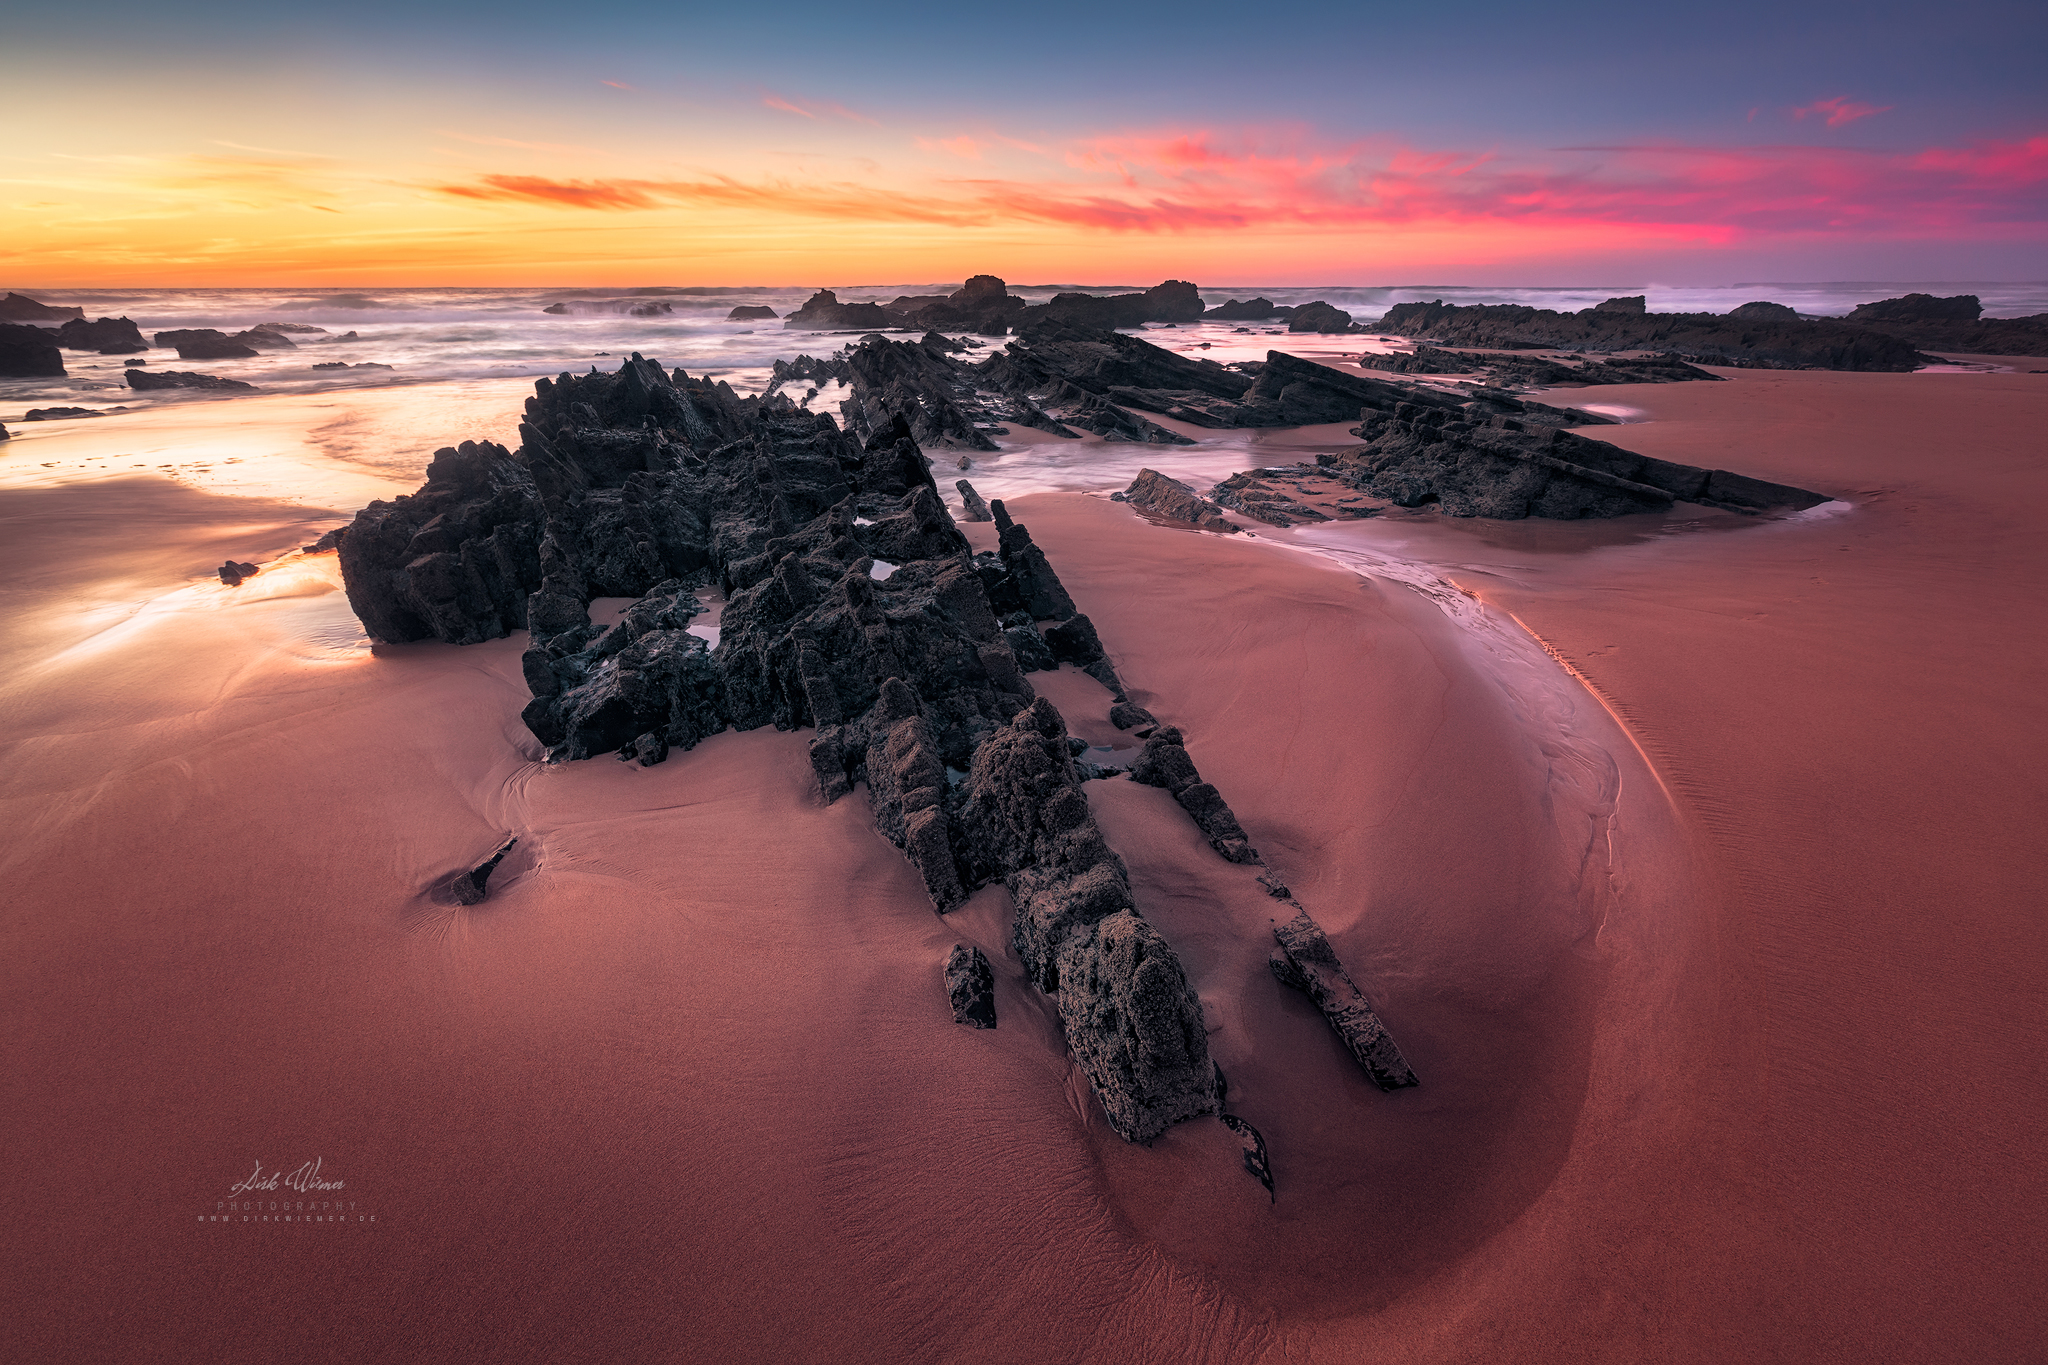 Tide Stones (Praia de Castelejo / Algarve), Portugal